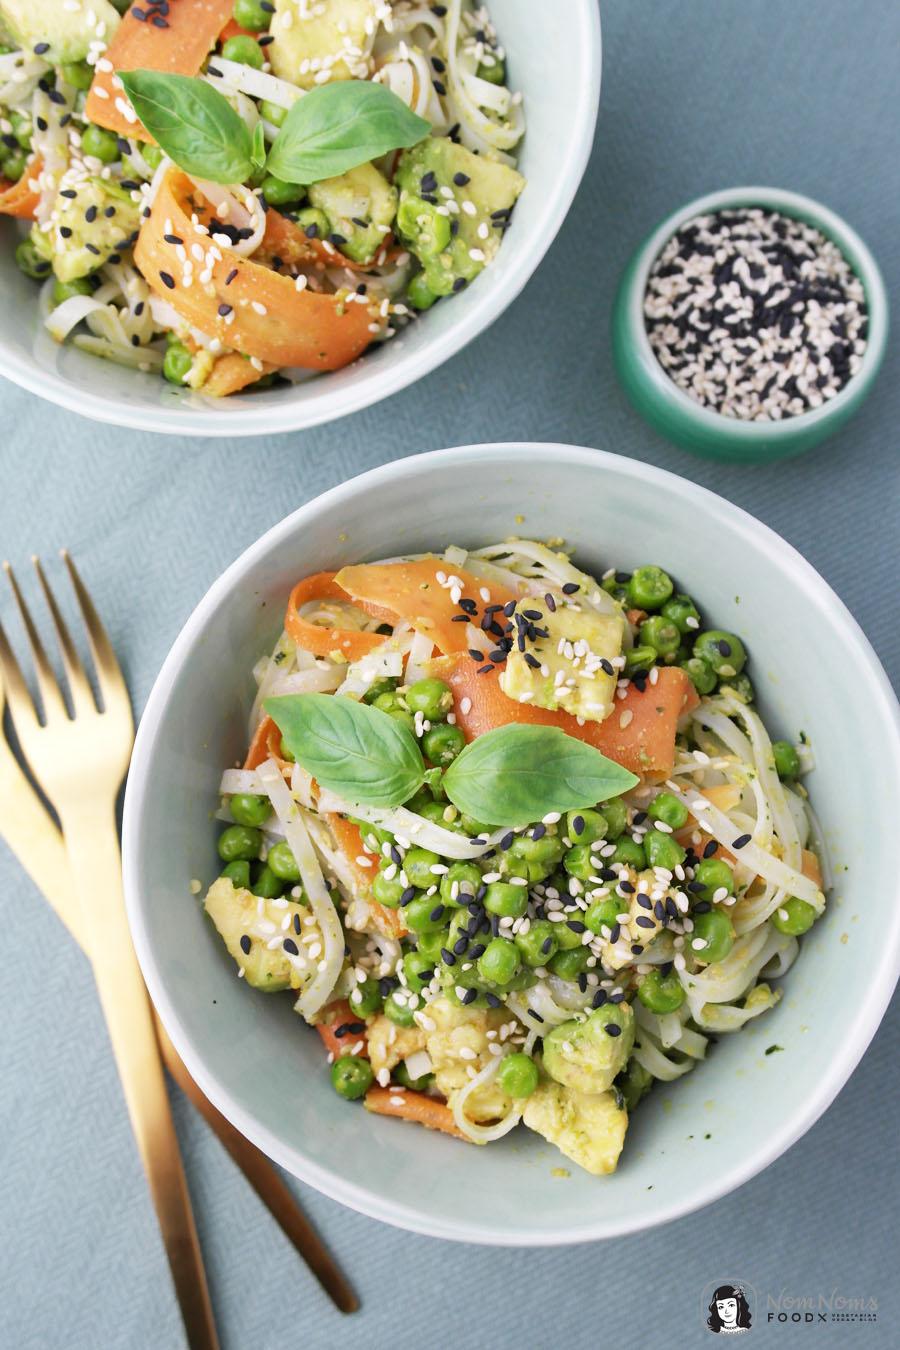 Reisnudelsalat mit Sesam-Basilikum-Pesto, Möhren, Erbsen und Avocado ❤